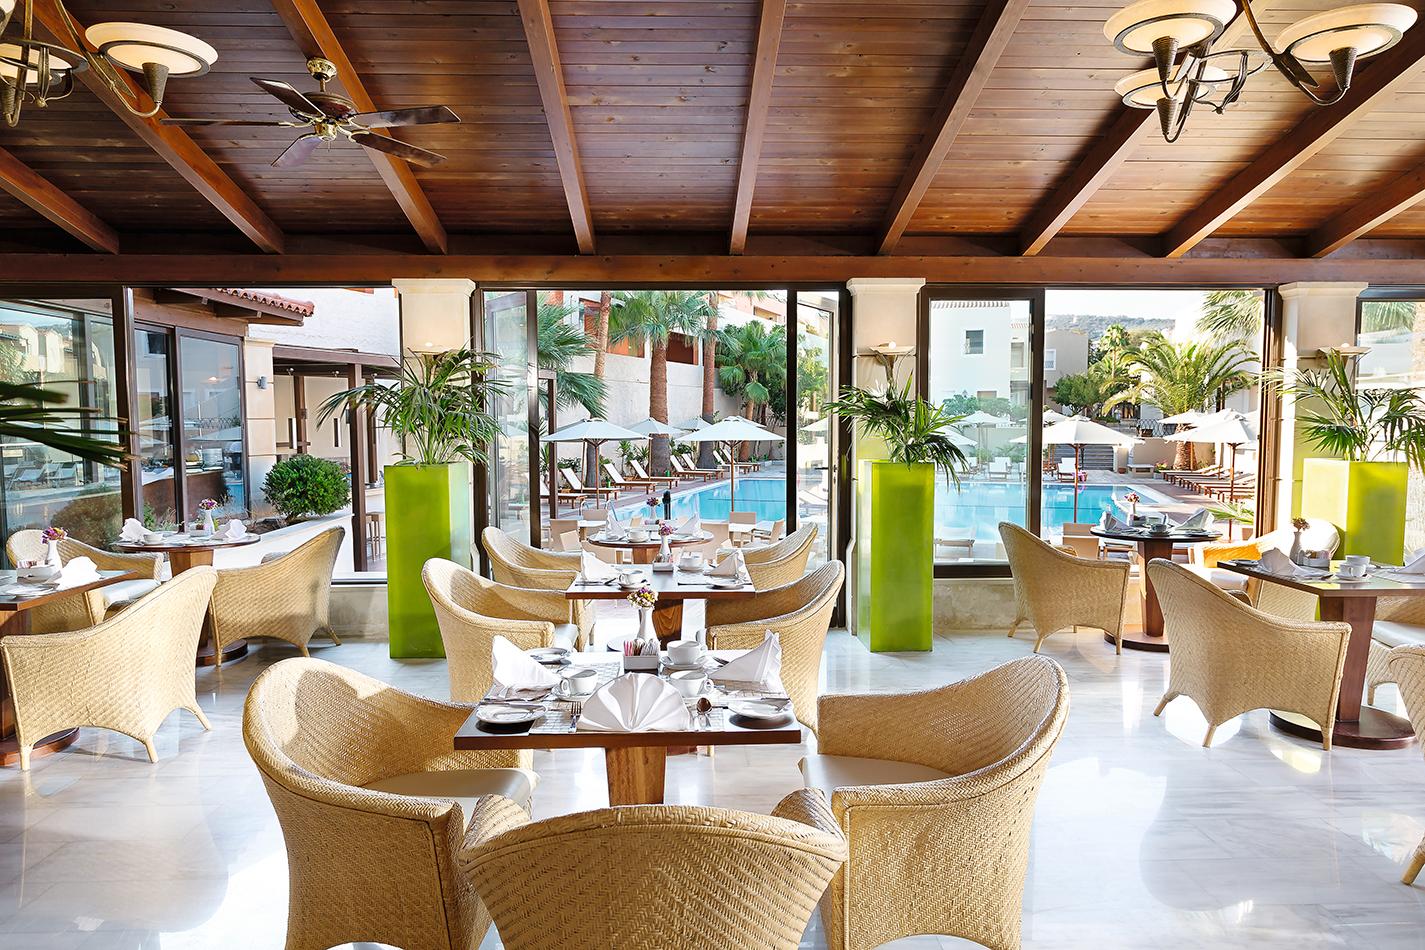 GrandLeoniki_09_Restaurant-Overlooking-hotels-Pool